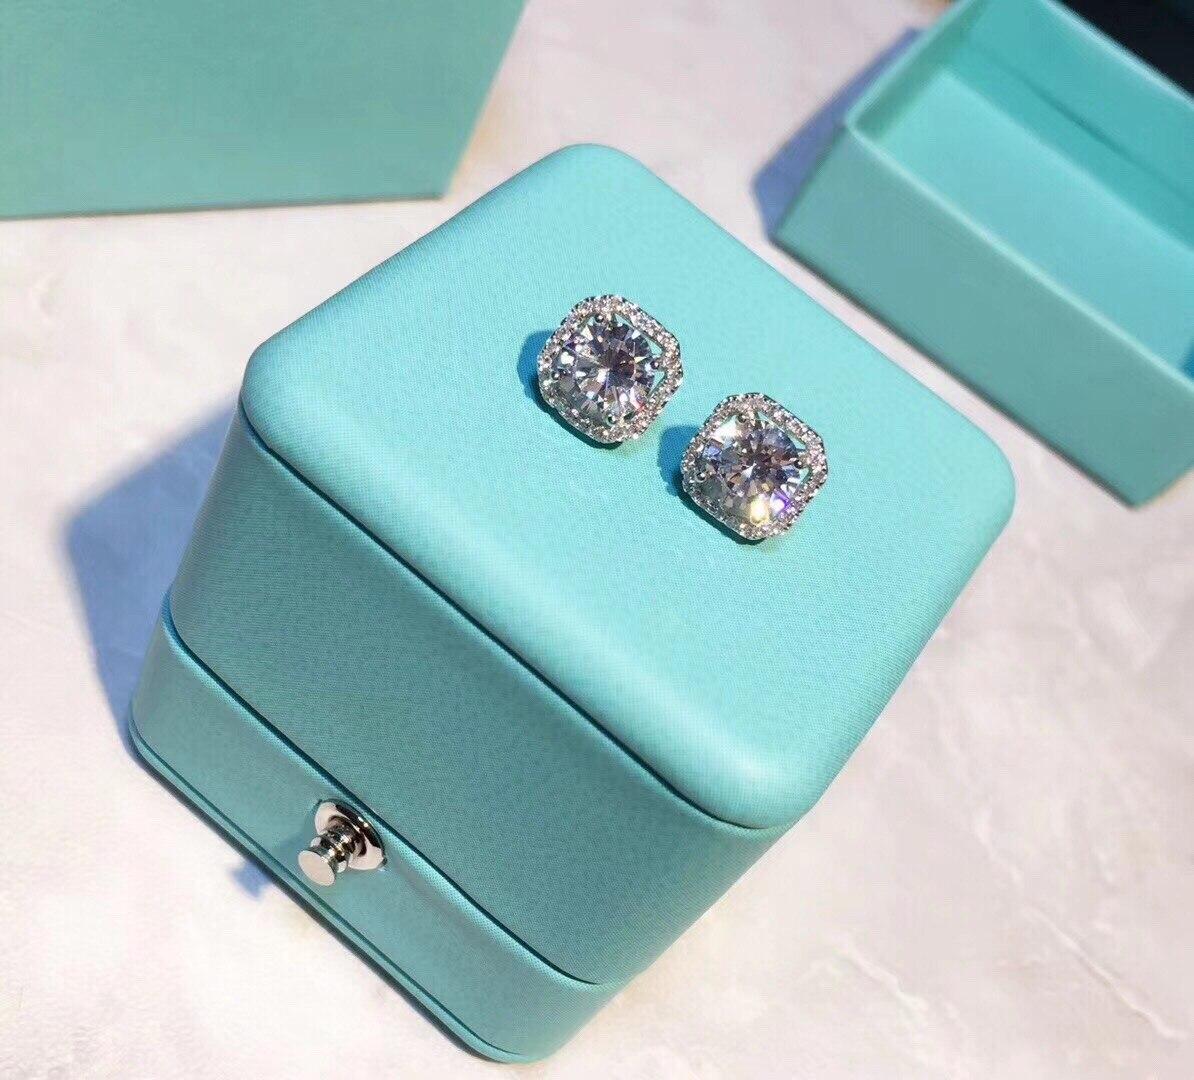 TSHOU158 Kreative mode Quadrat kristall TIFF 925 silber ohrring persönlichkeit farbe ohrringe